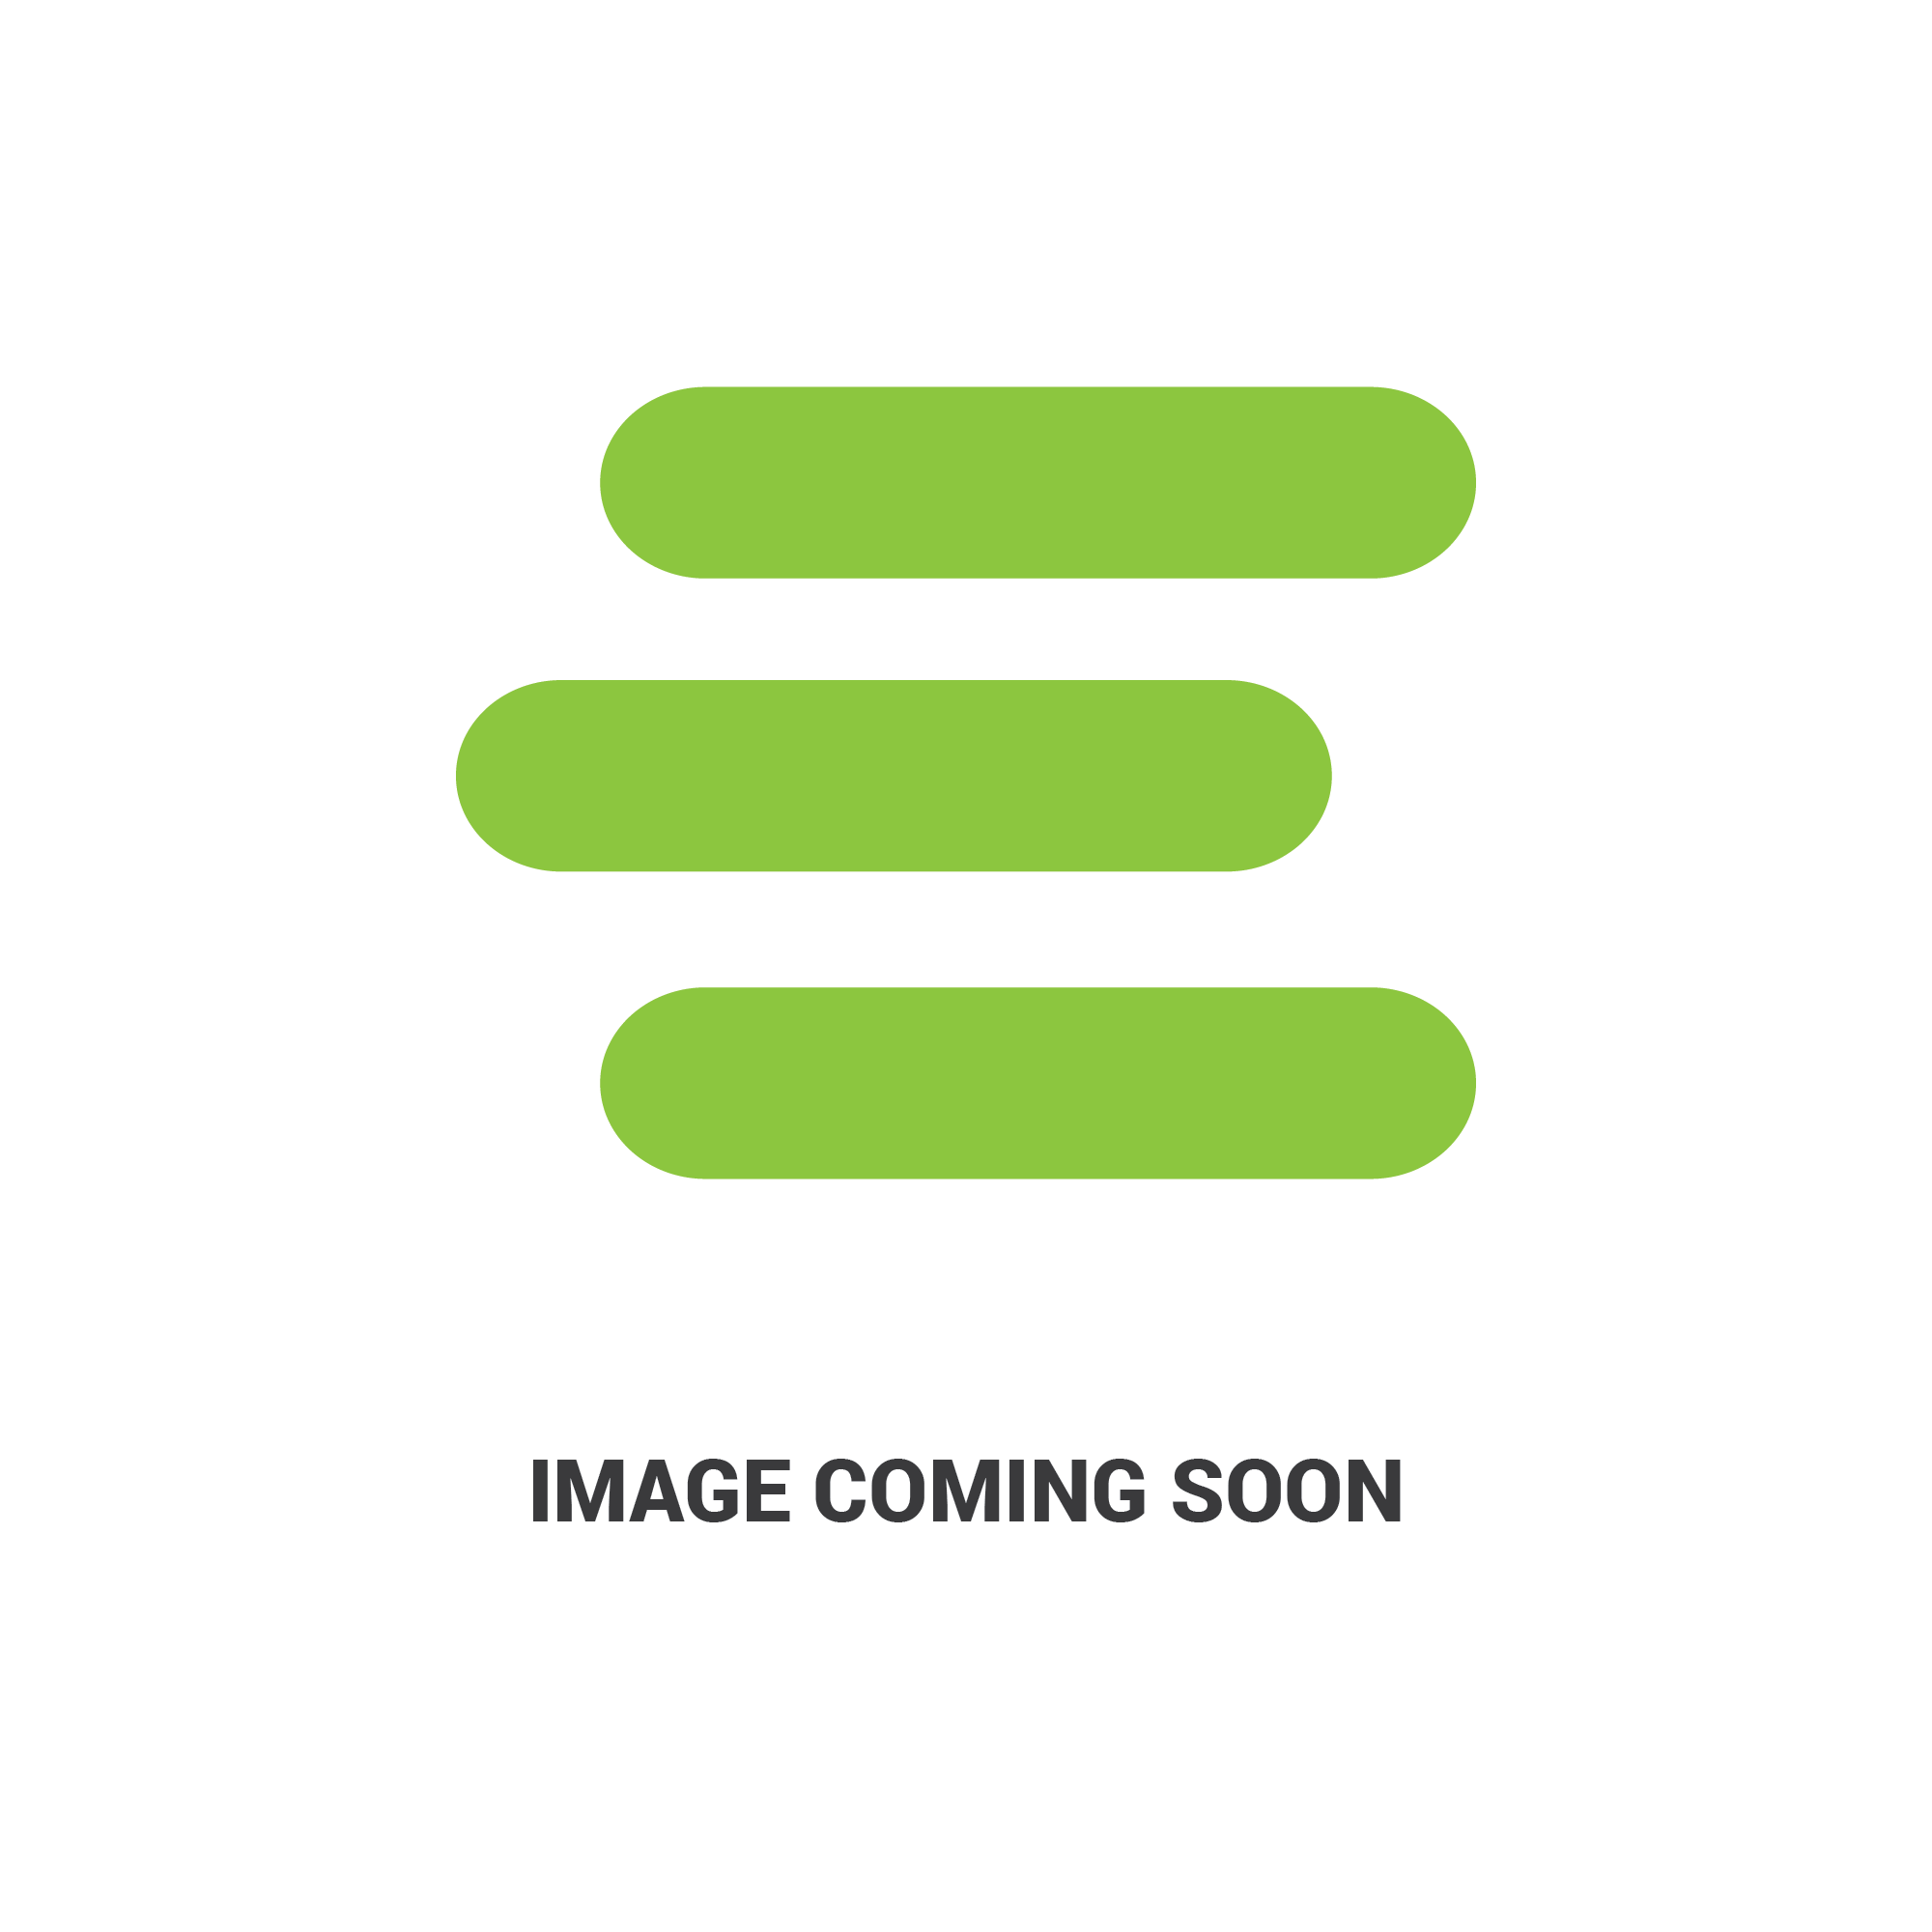 E-PM18295edit 1.jpg